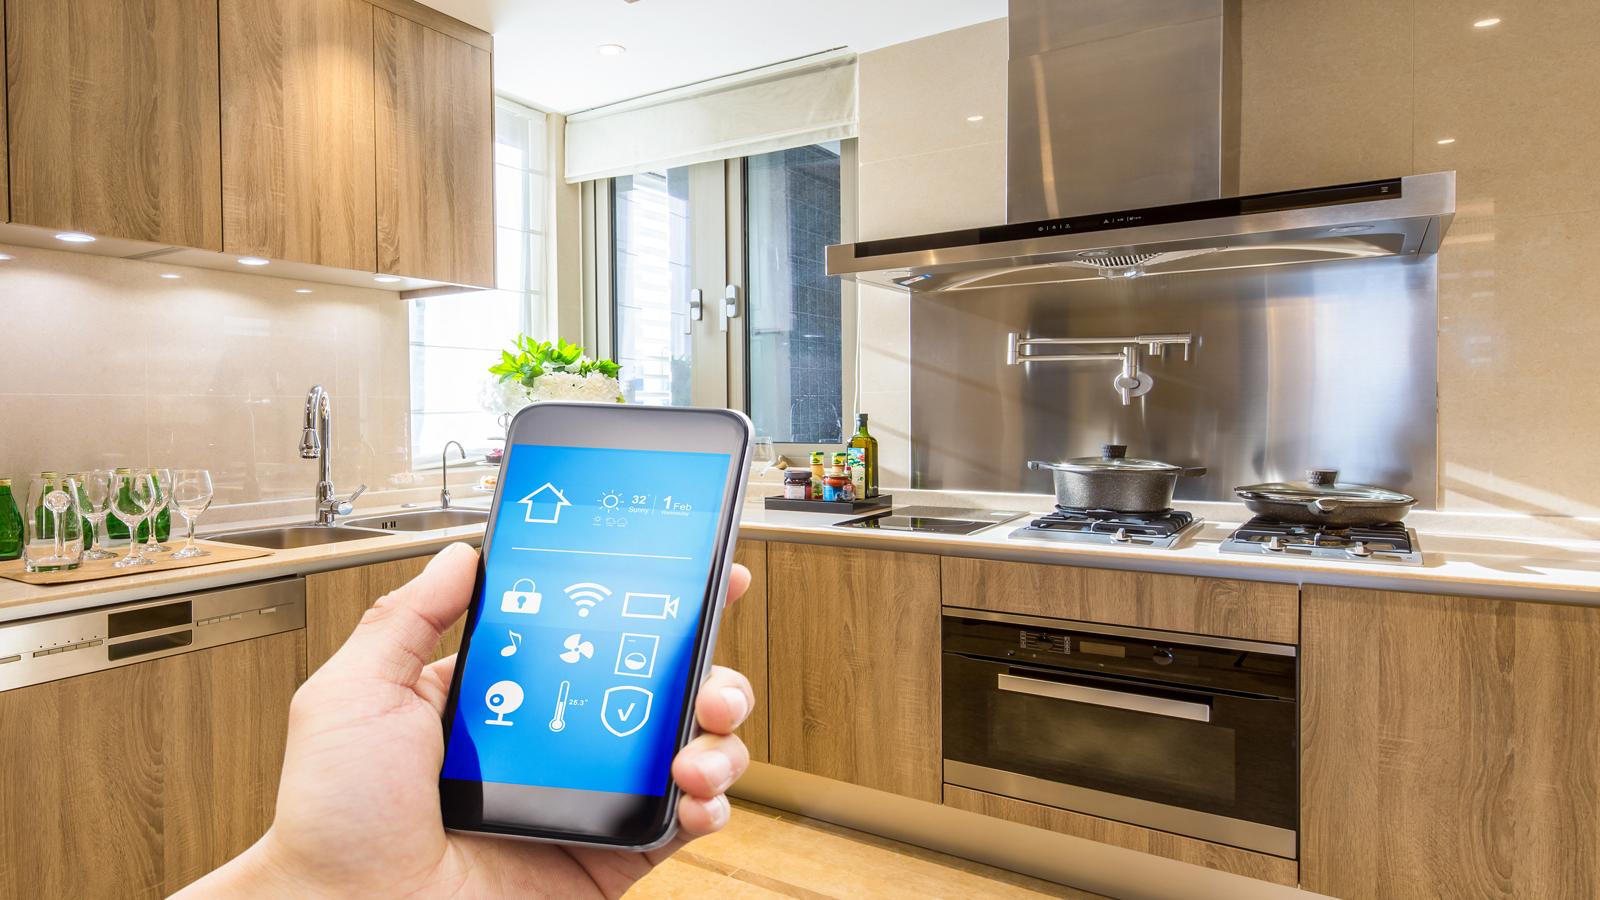 Sharp & Rezept-Start-up SideChef starten Smart-Küchen-Kooperation